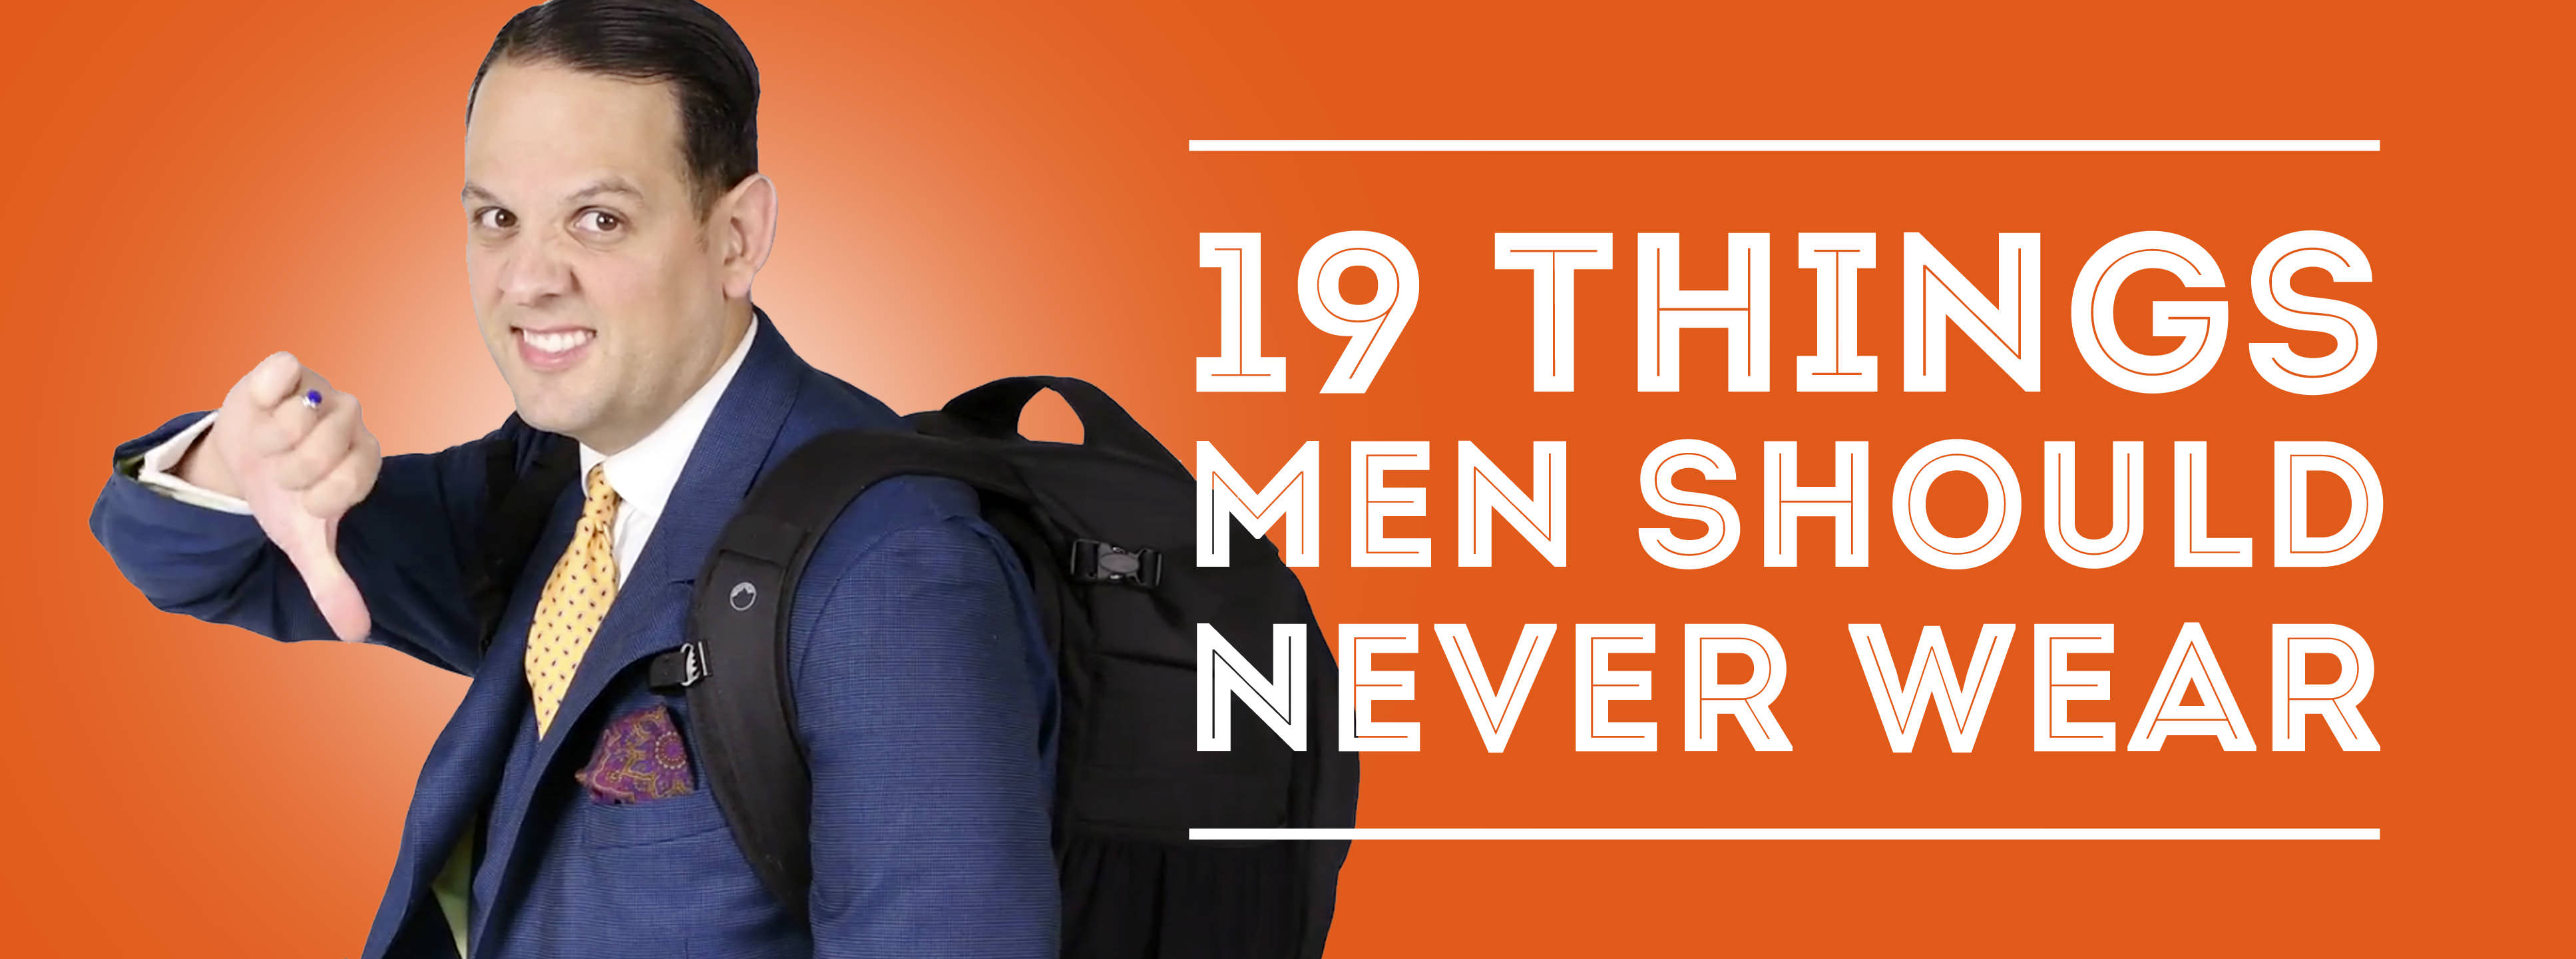 c9440e17 19 Things Men Should Never Wear — Gentleman's Gazette